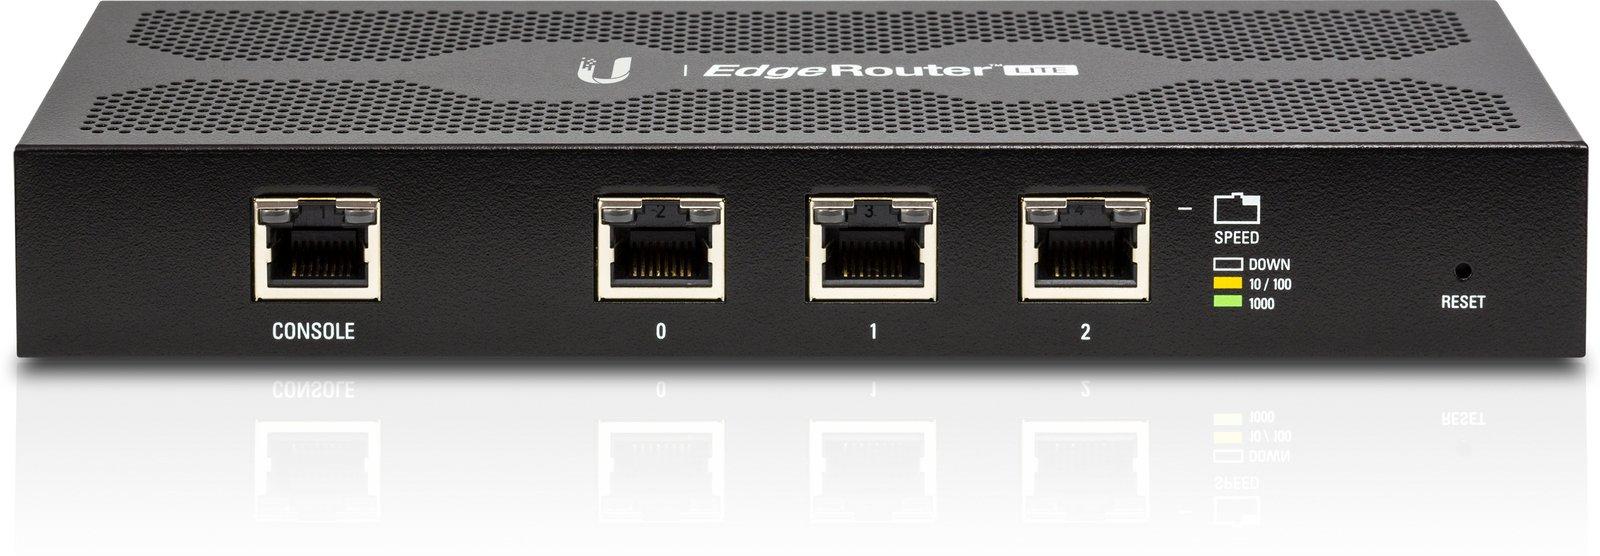 Ubiquiti Networks EdgeRouter Lite